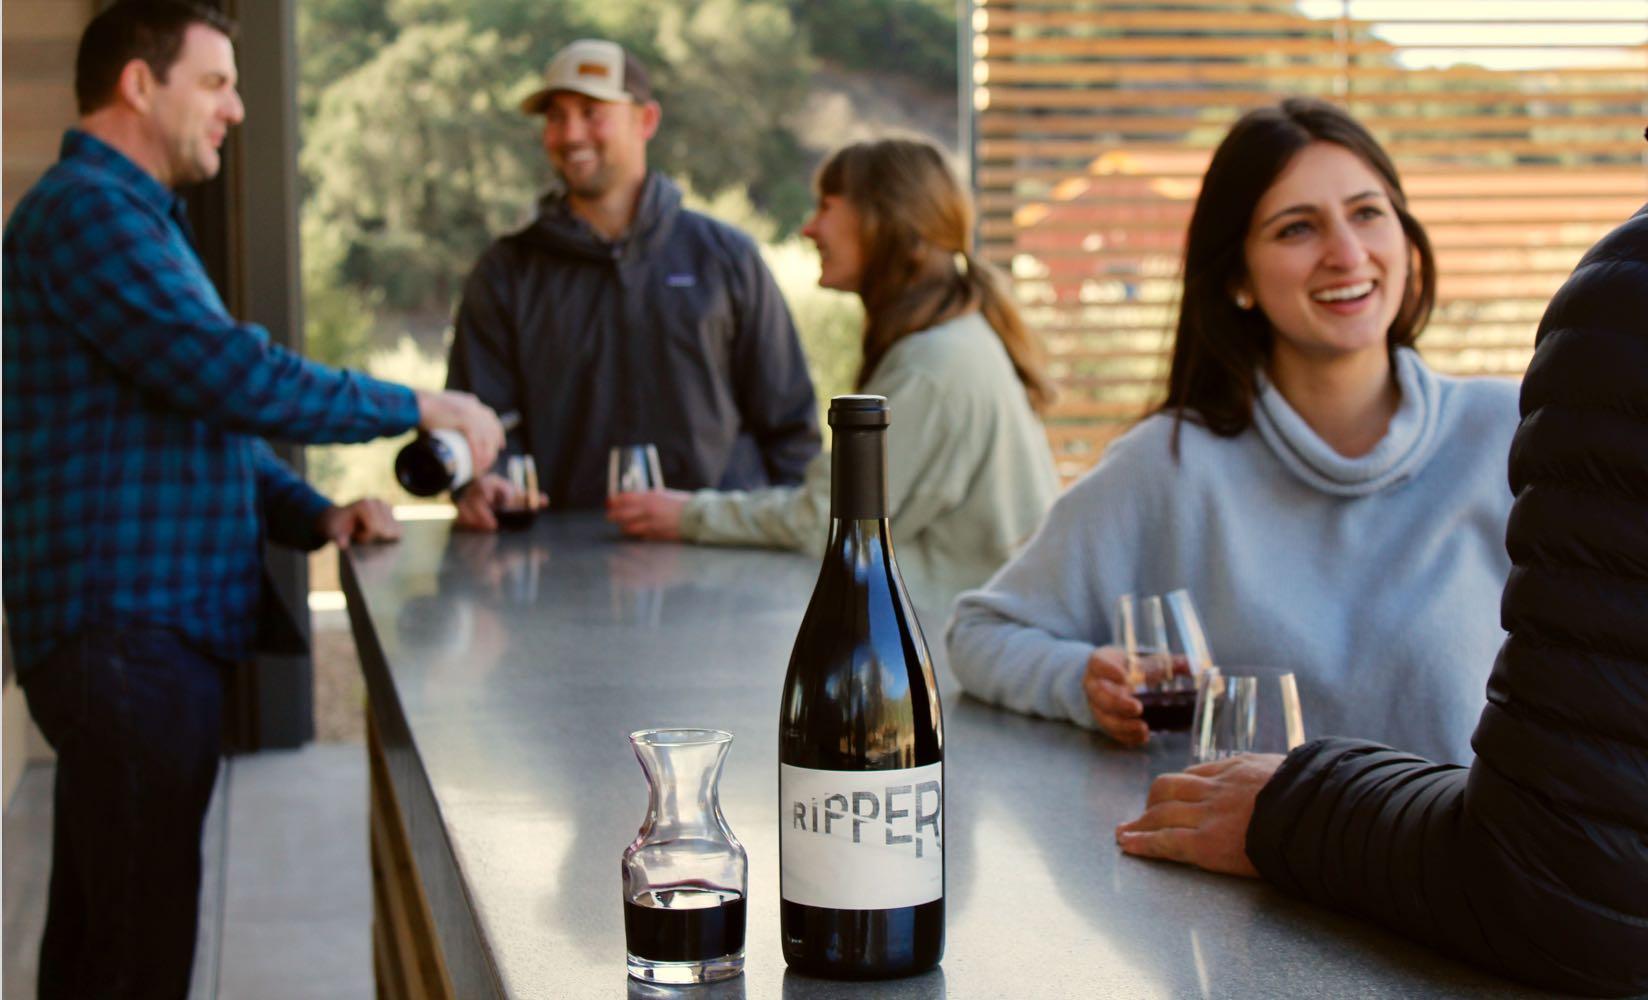 visitors wine tasting at the bar